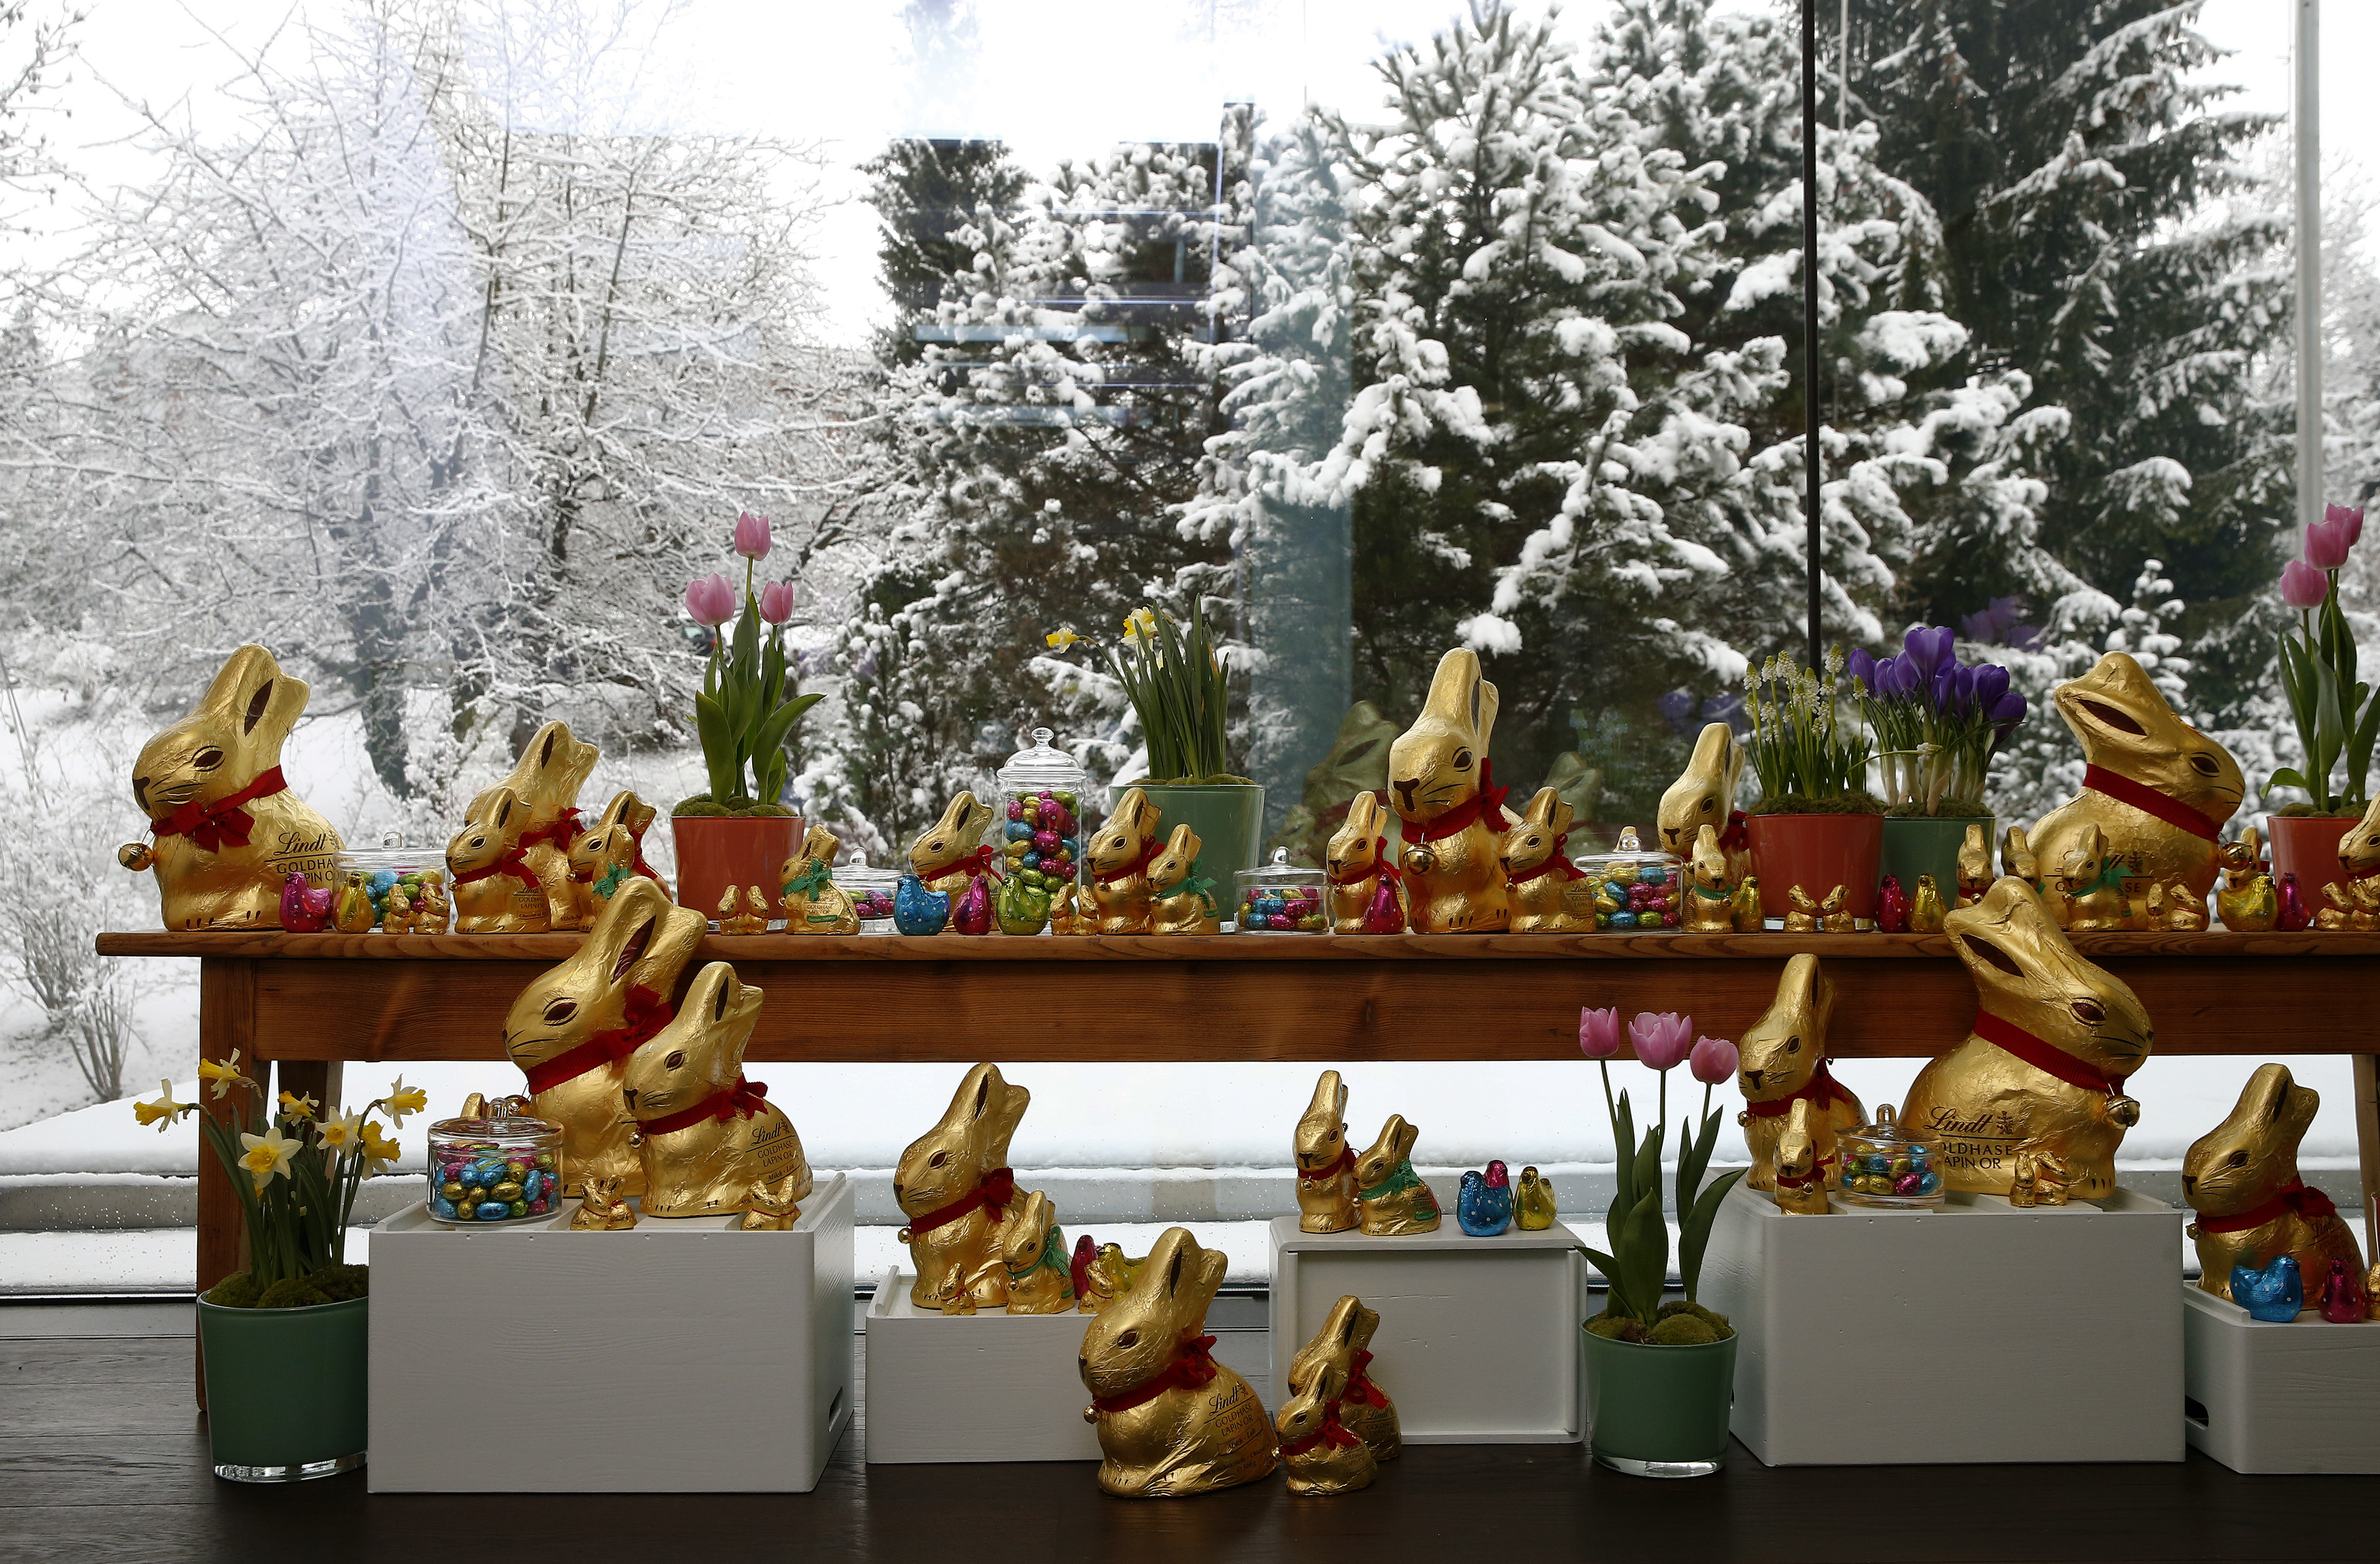 Lindt 'Goldhase' chocolate bunnies of Swiss chocolatier Lindt & Spruengli. REUTERS/Arnd Wiegmann